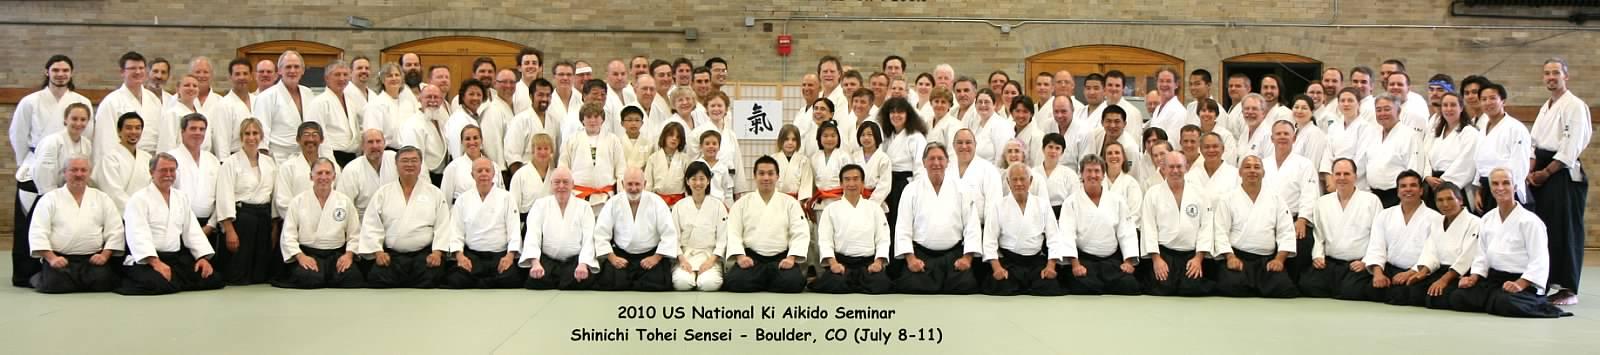 2010 National Ki Aikido group copy